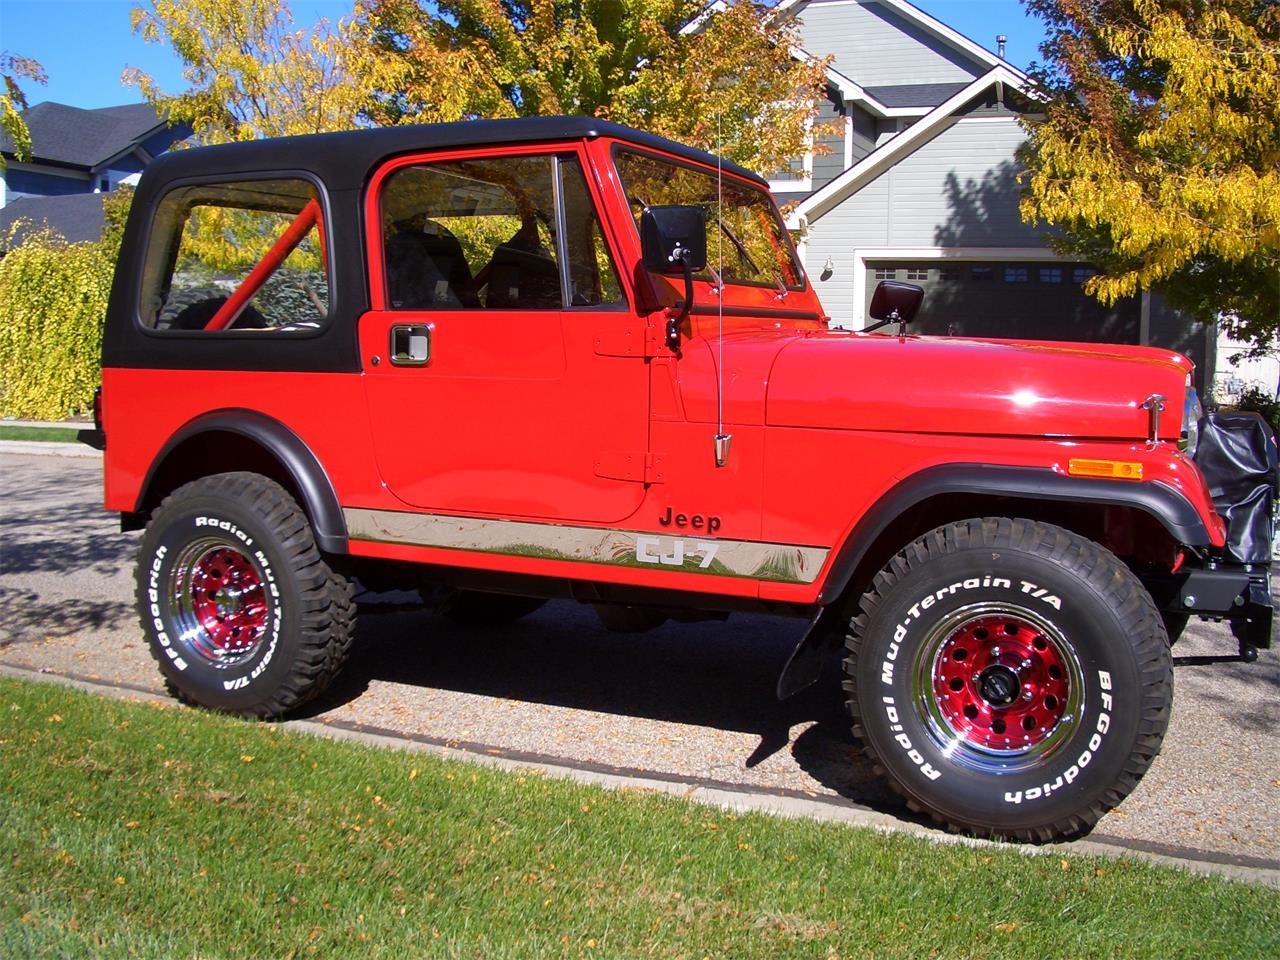 1986 jeep cj7 for sale cc 711900. Black Bedroom Furniture Sets. Home Design Ideas